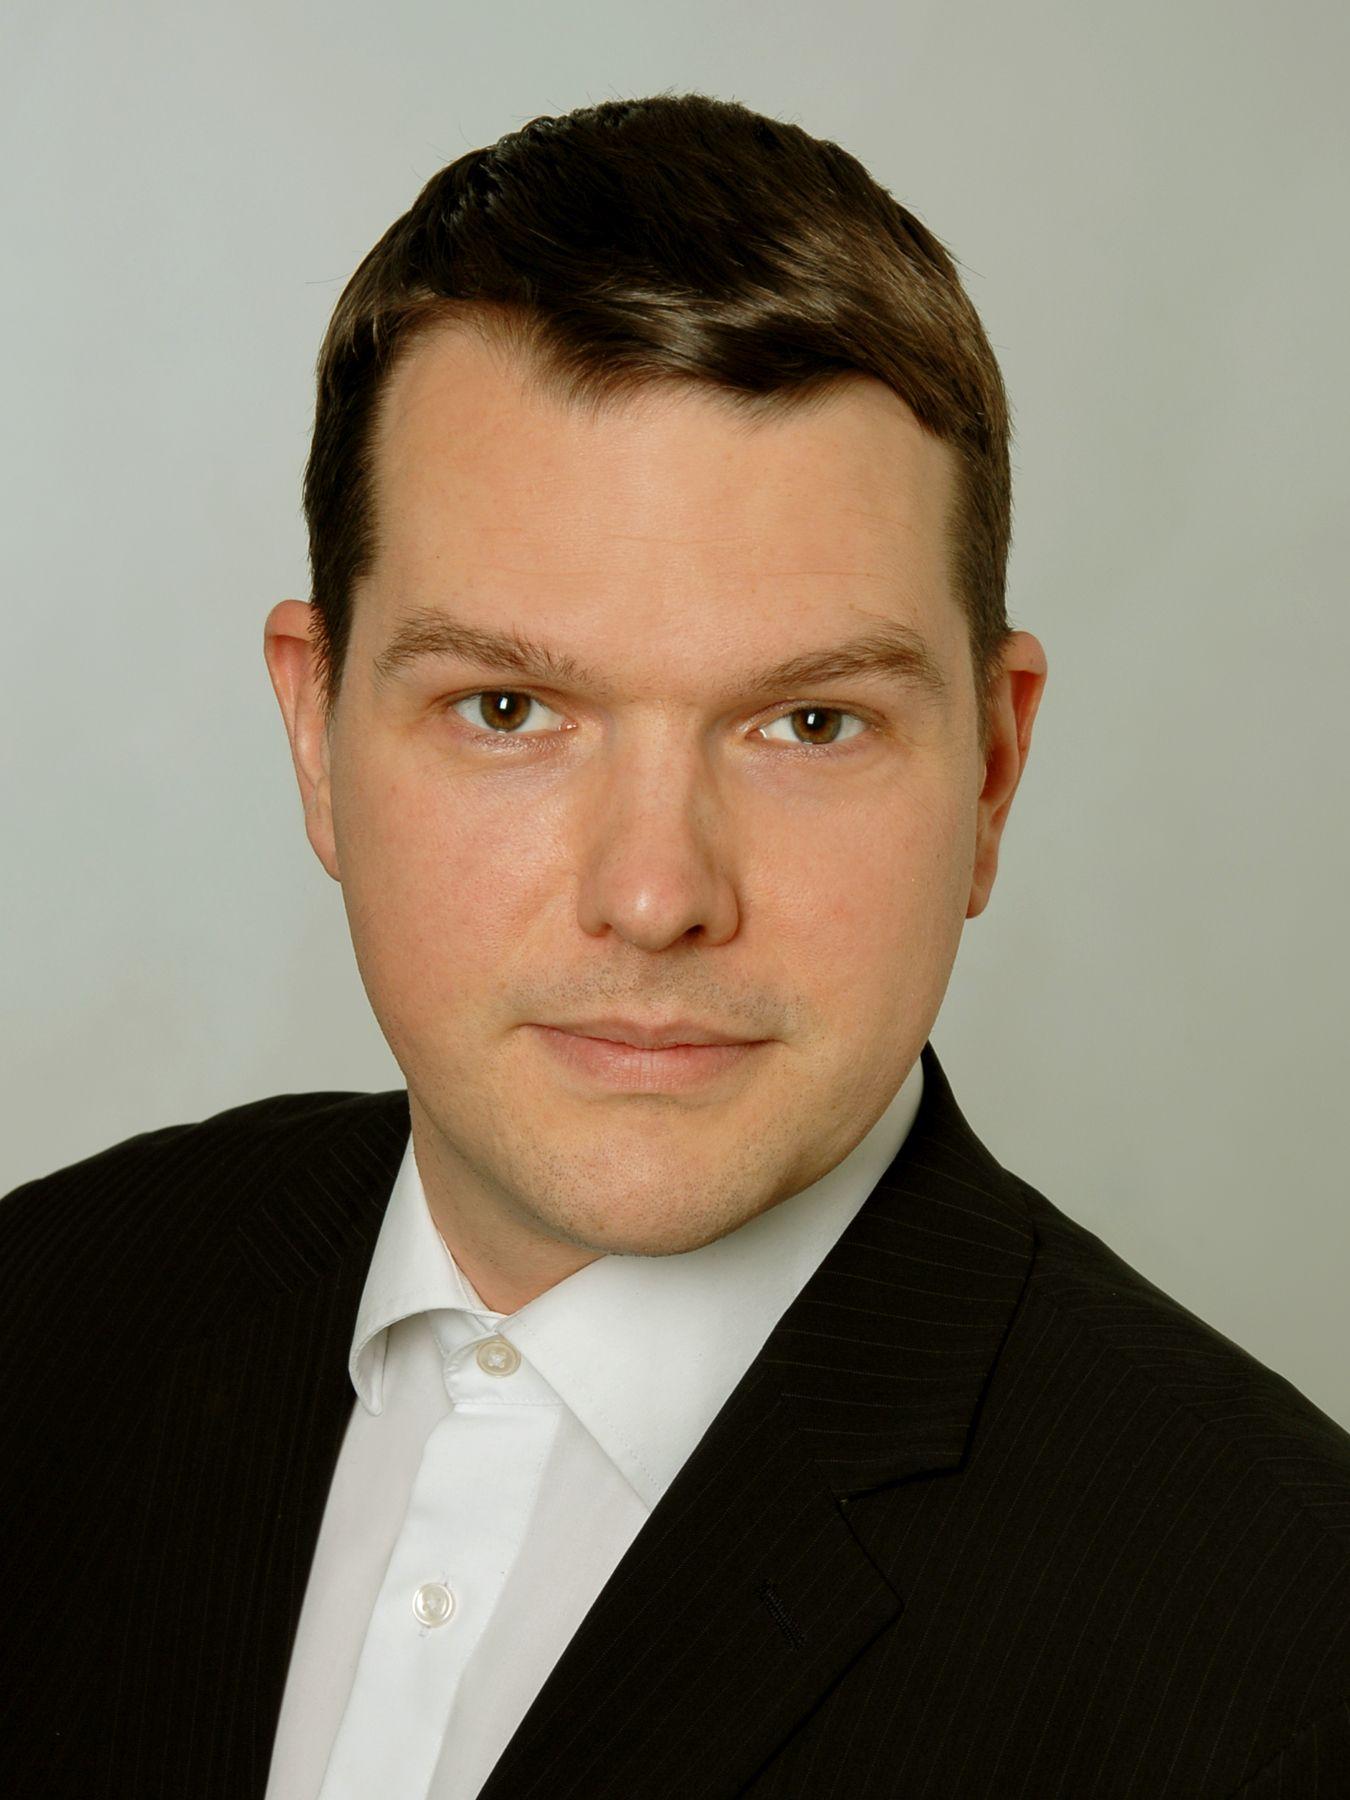 Michael Röpcke